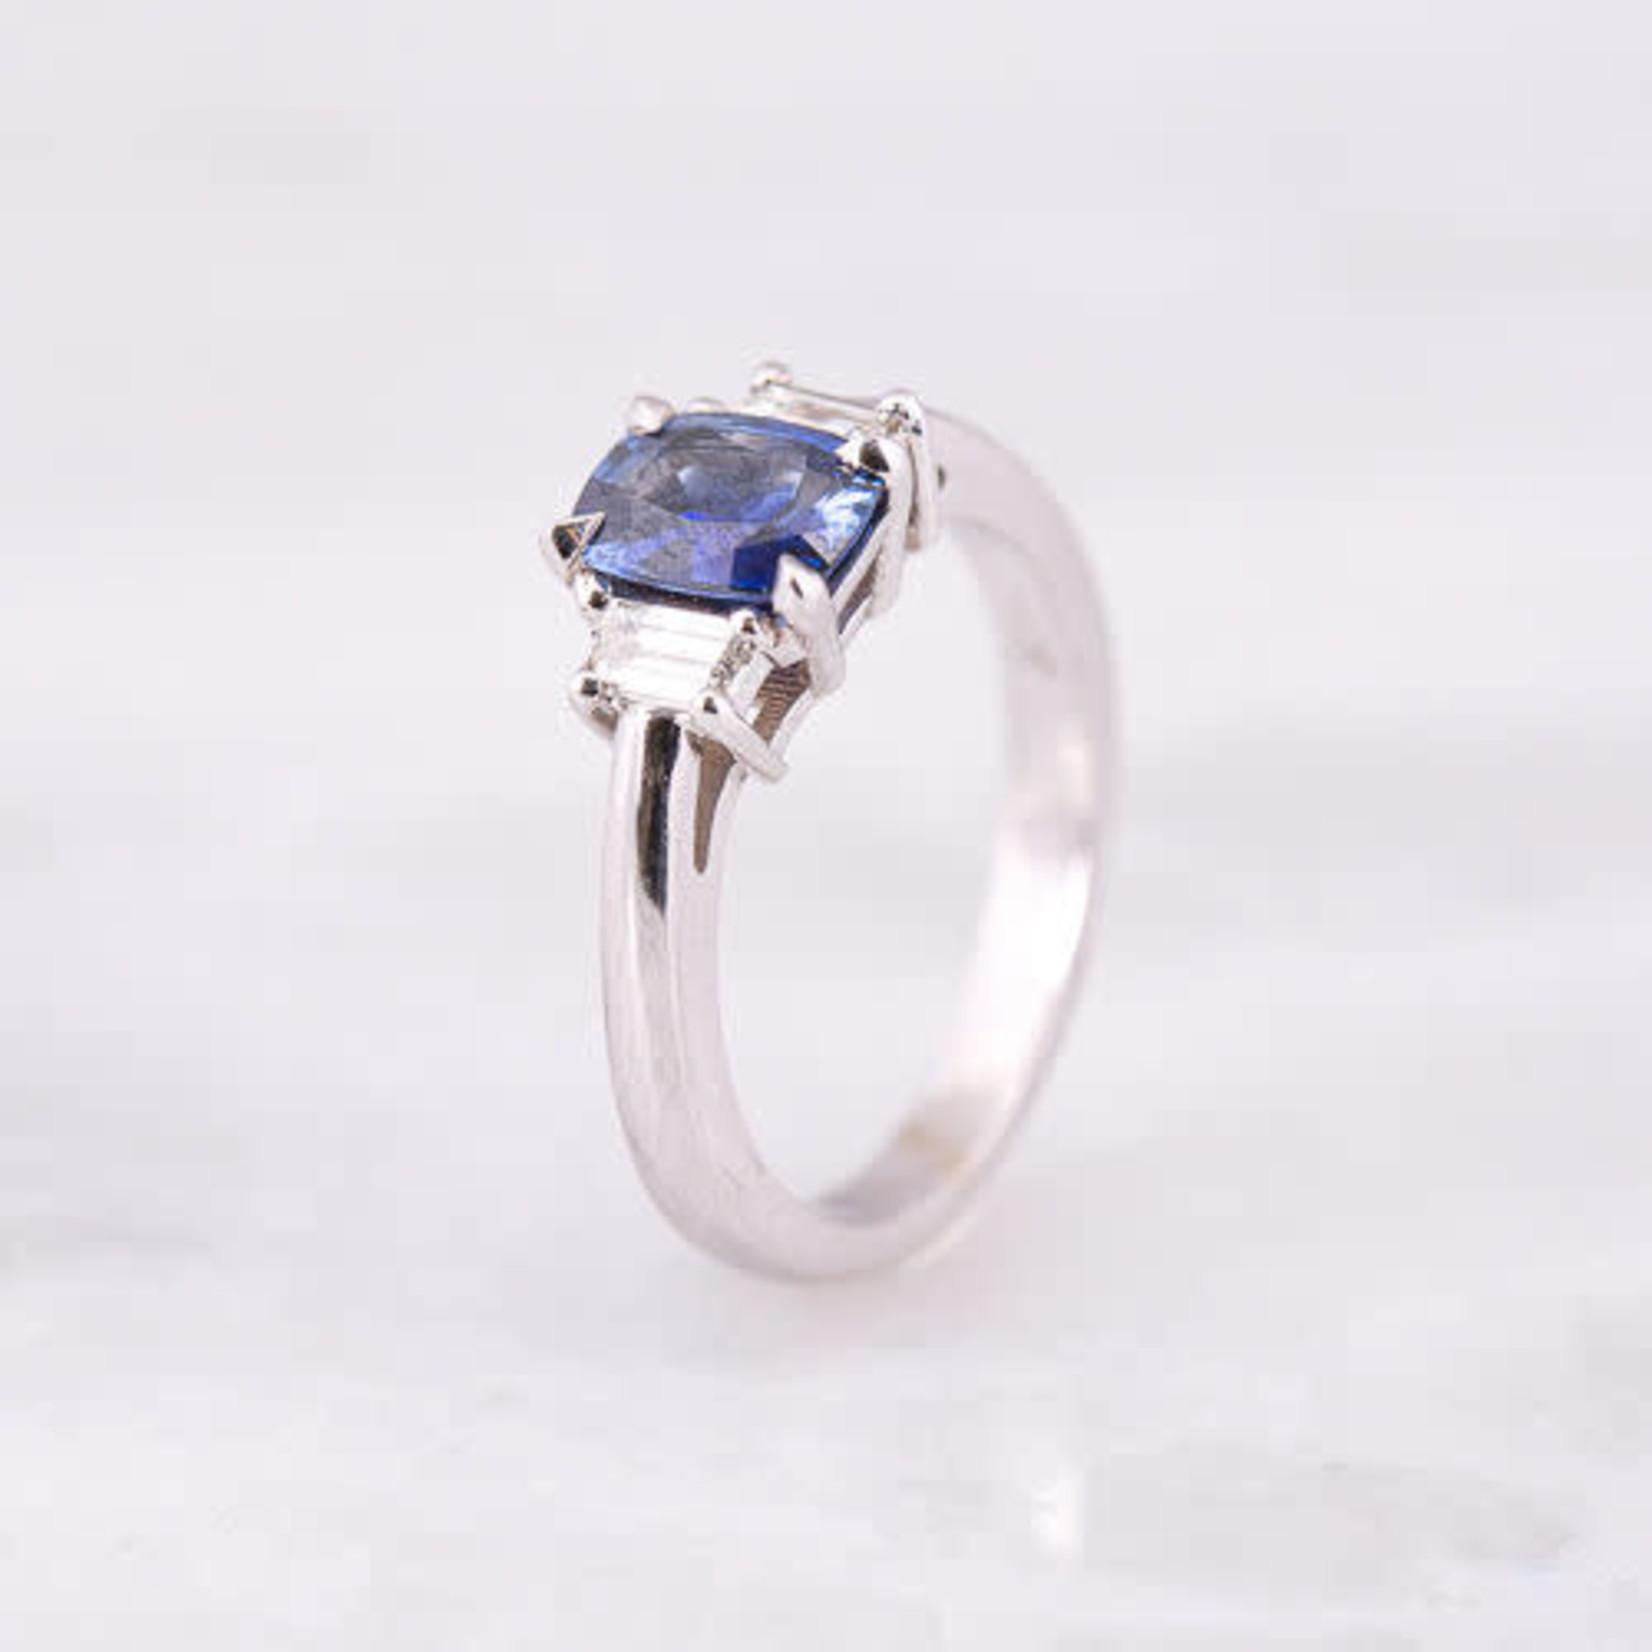 14KW Gold Cushion Sapphire 1.03ctw & Diamond 0.29ctw Ring